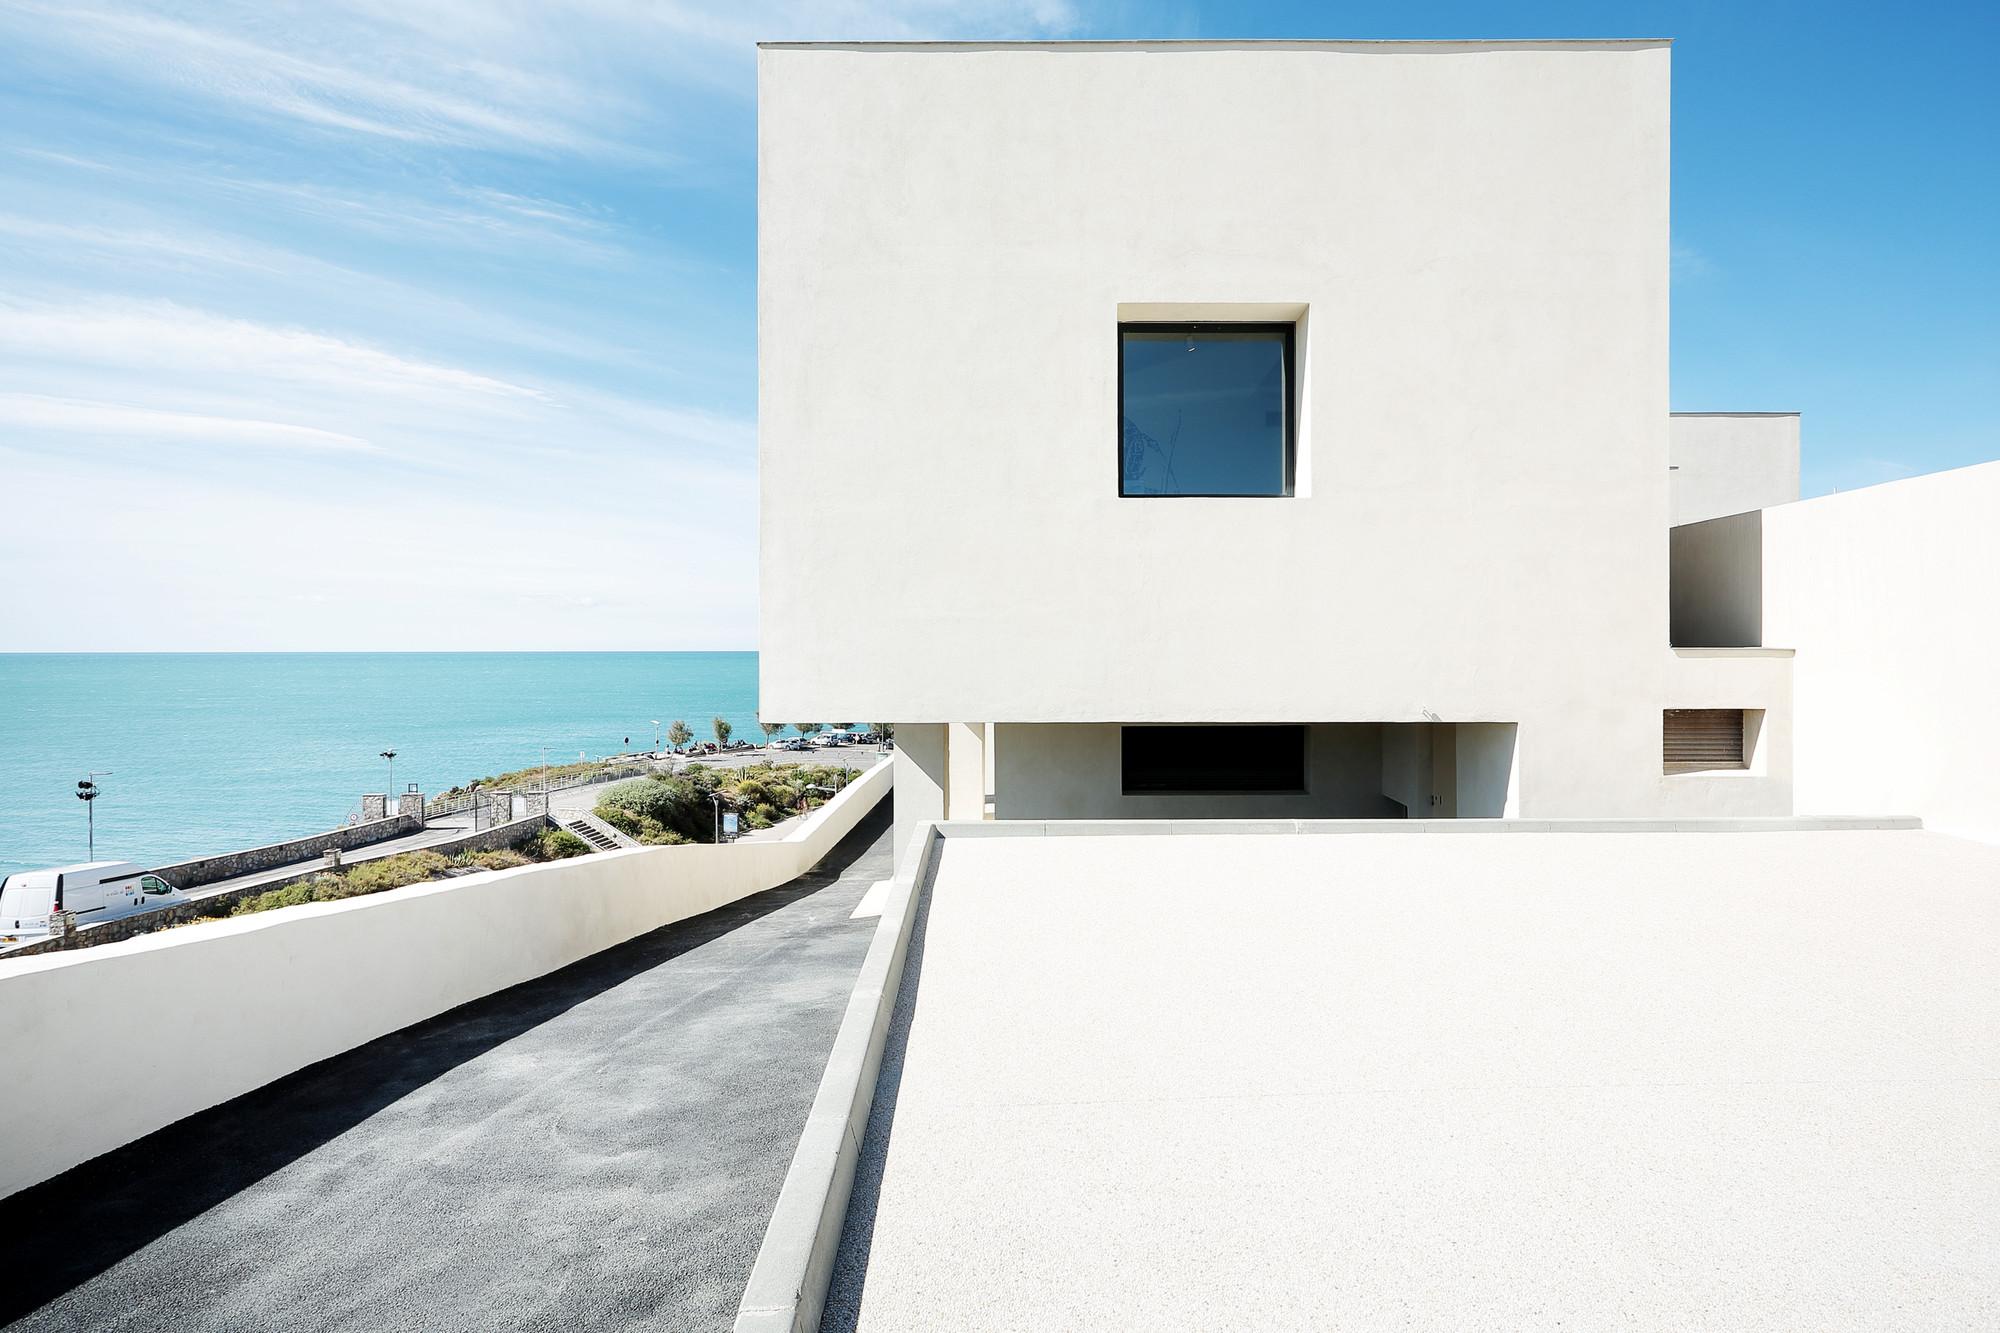 Museum Of The Sea In Sete / C+D Architecture, © Marie-Caroline LUCAT